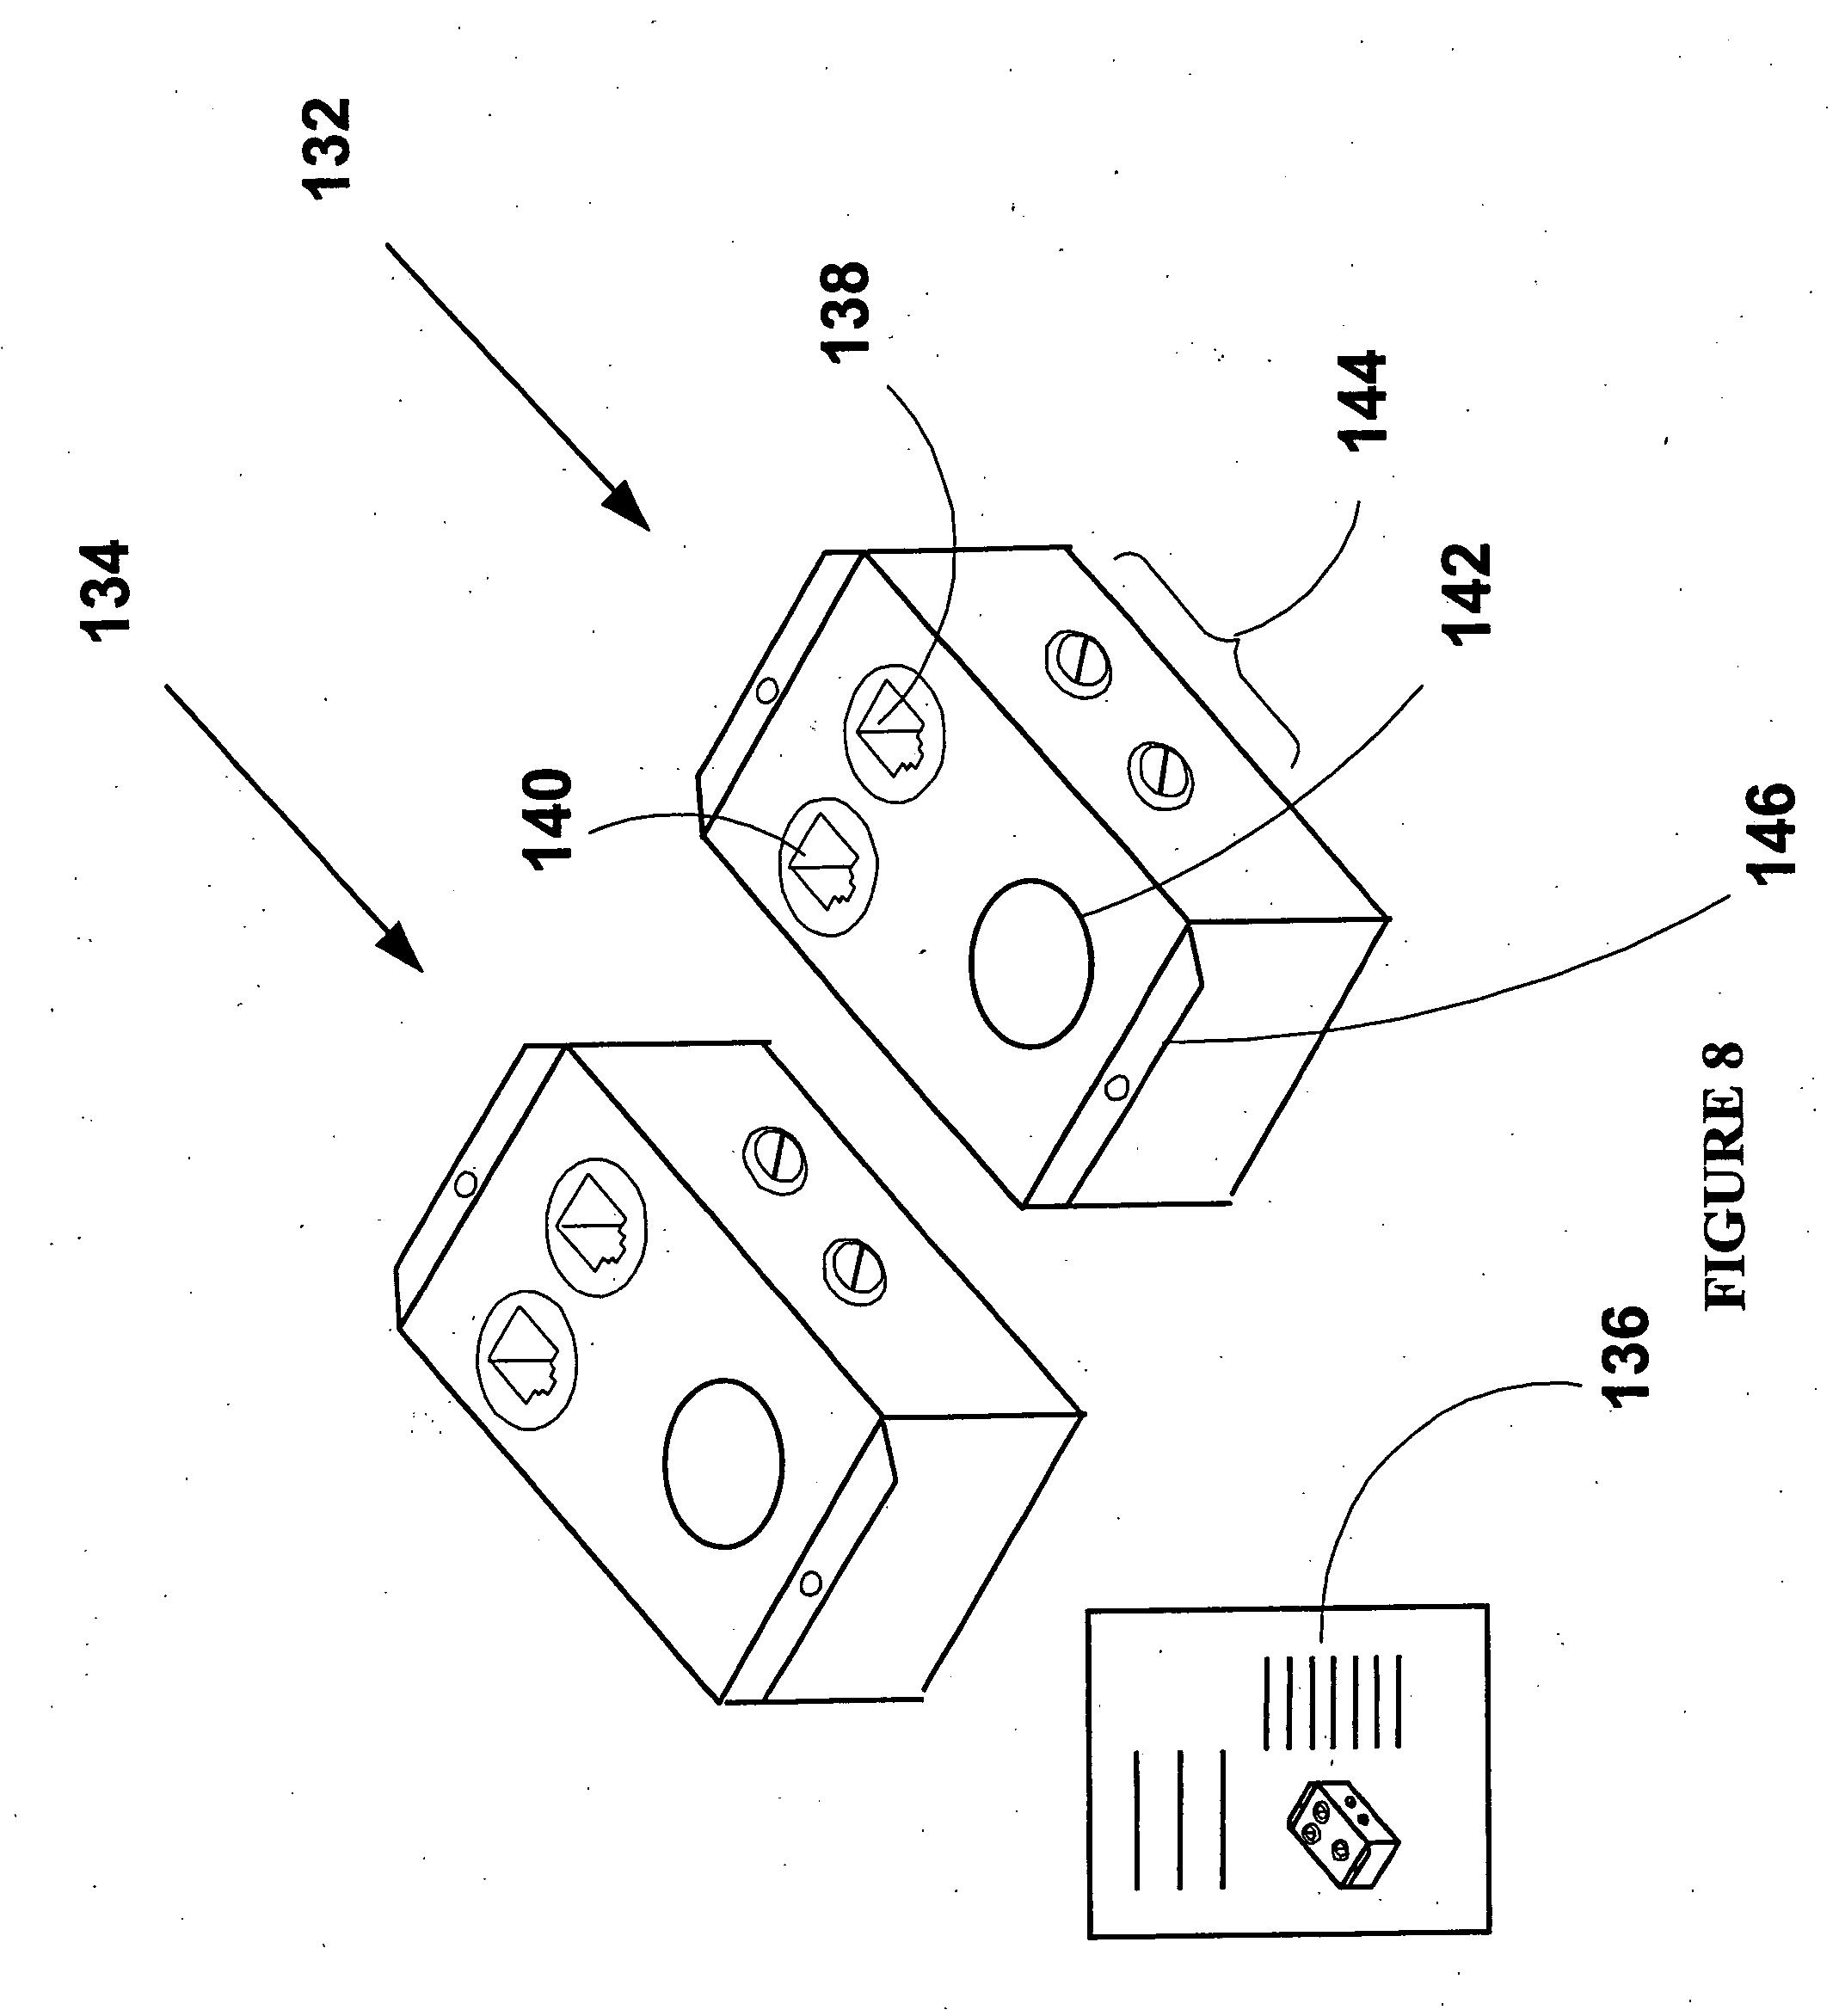 patente us20050232299